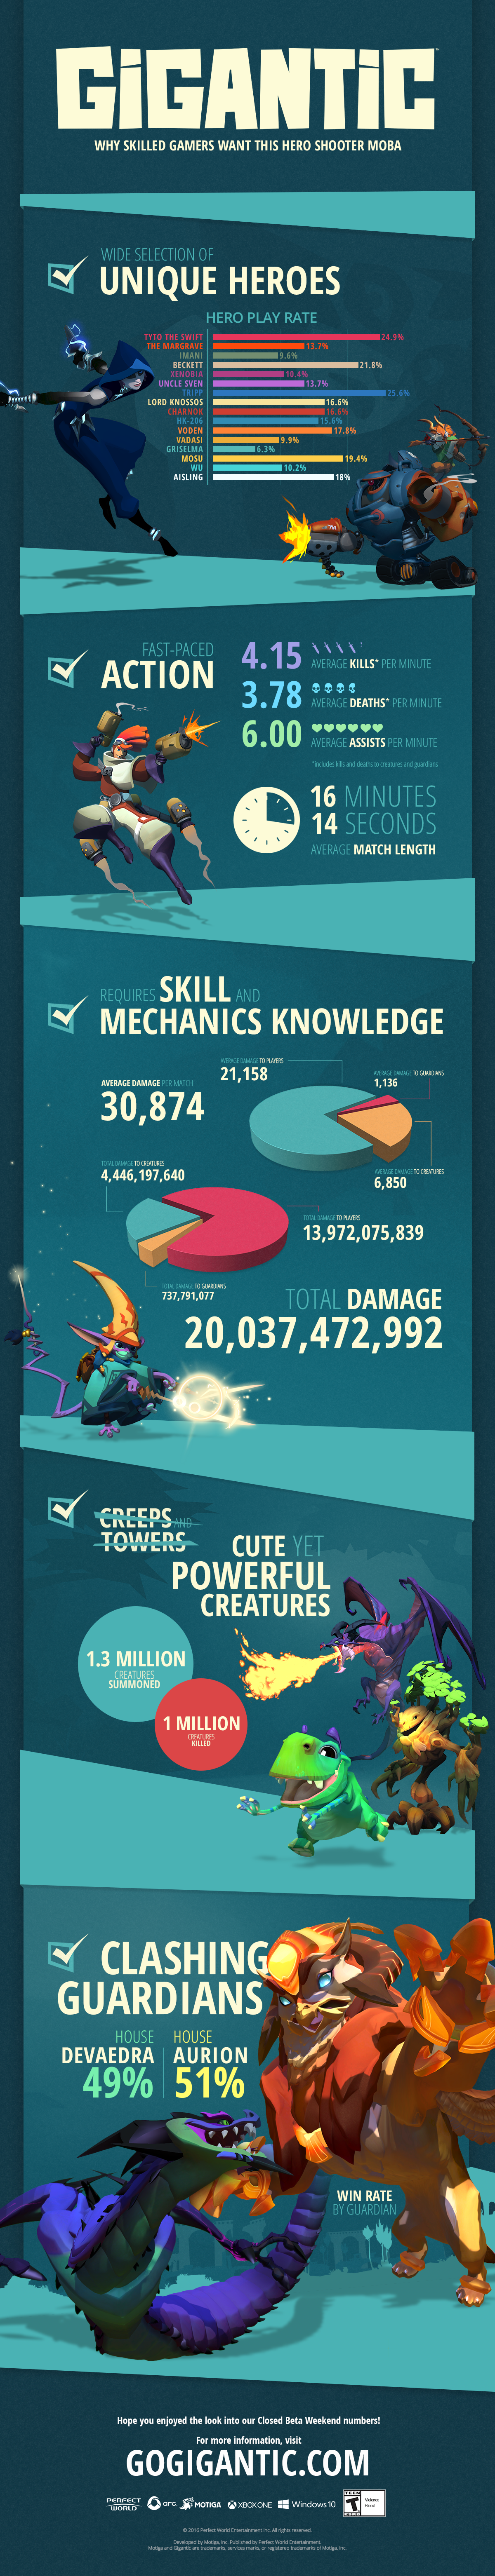 gigantic_infographic